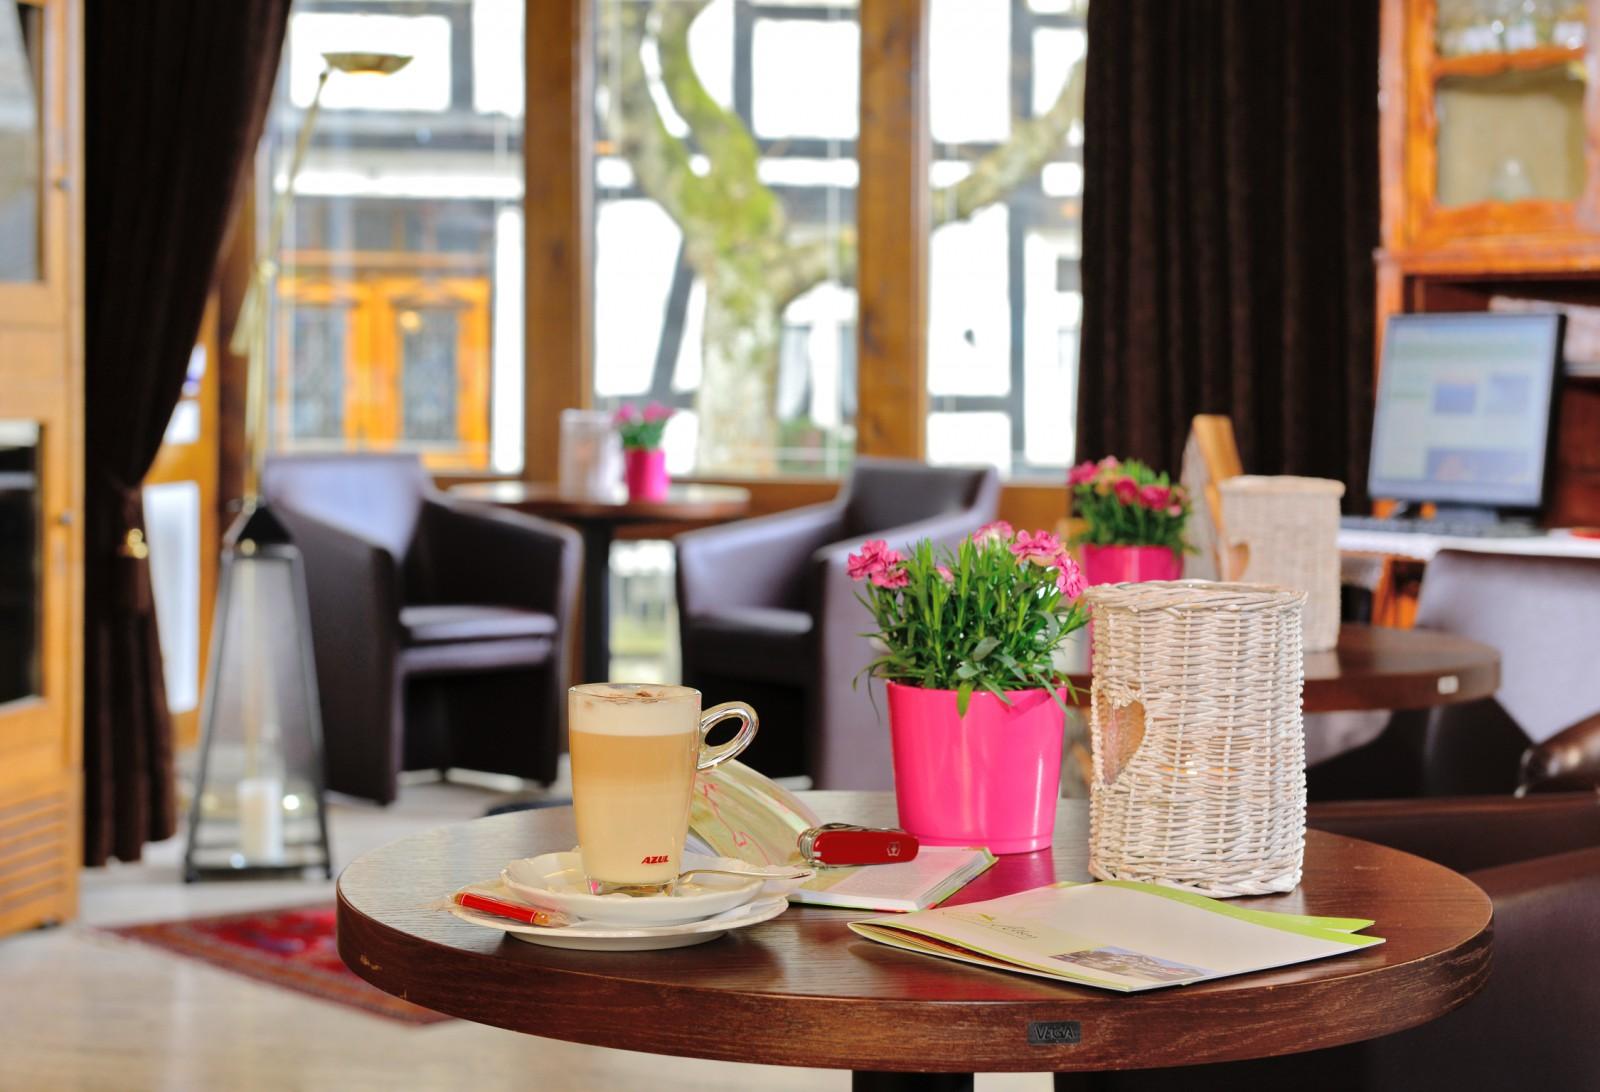 restaurant landhotel albers in schmallenberg. Black Bedroom Furniture Sets. Home Design Ideas